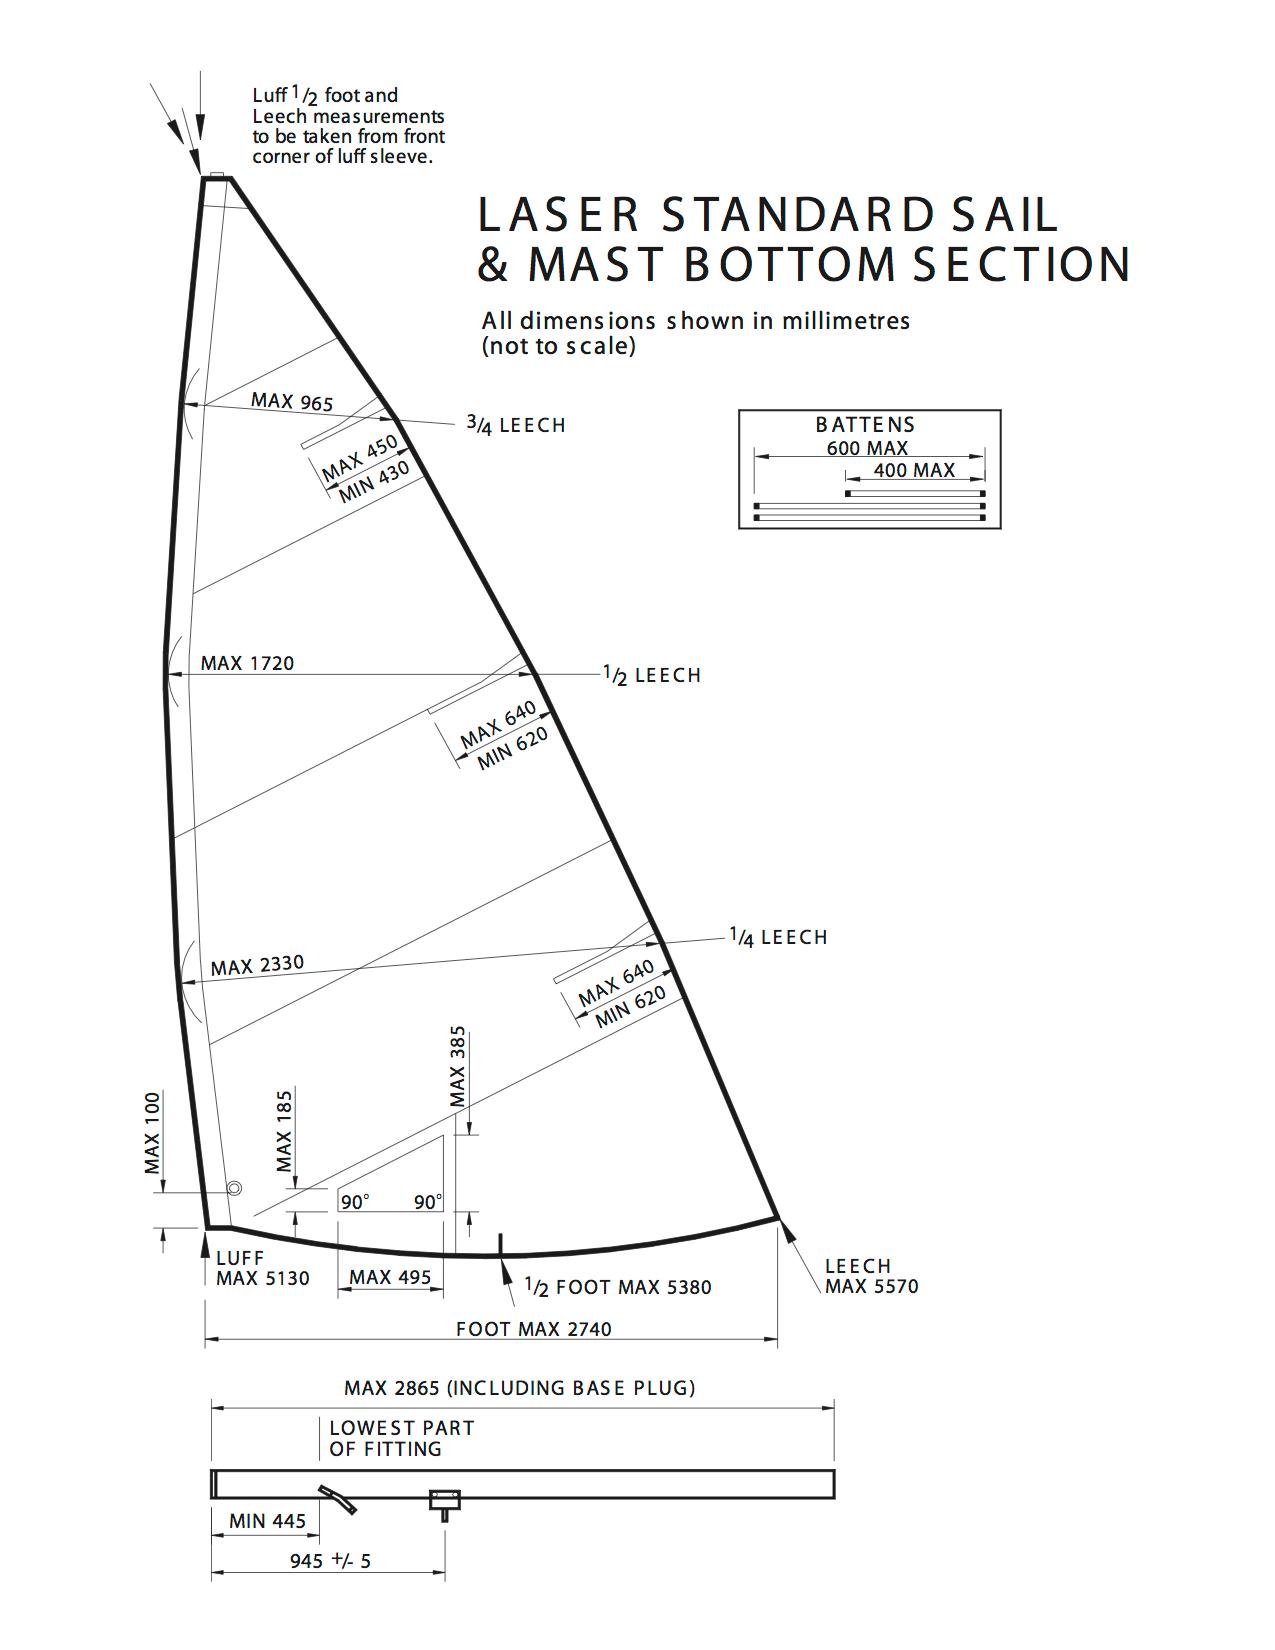 hight resolution of measurement diagram std sail mastlower